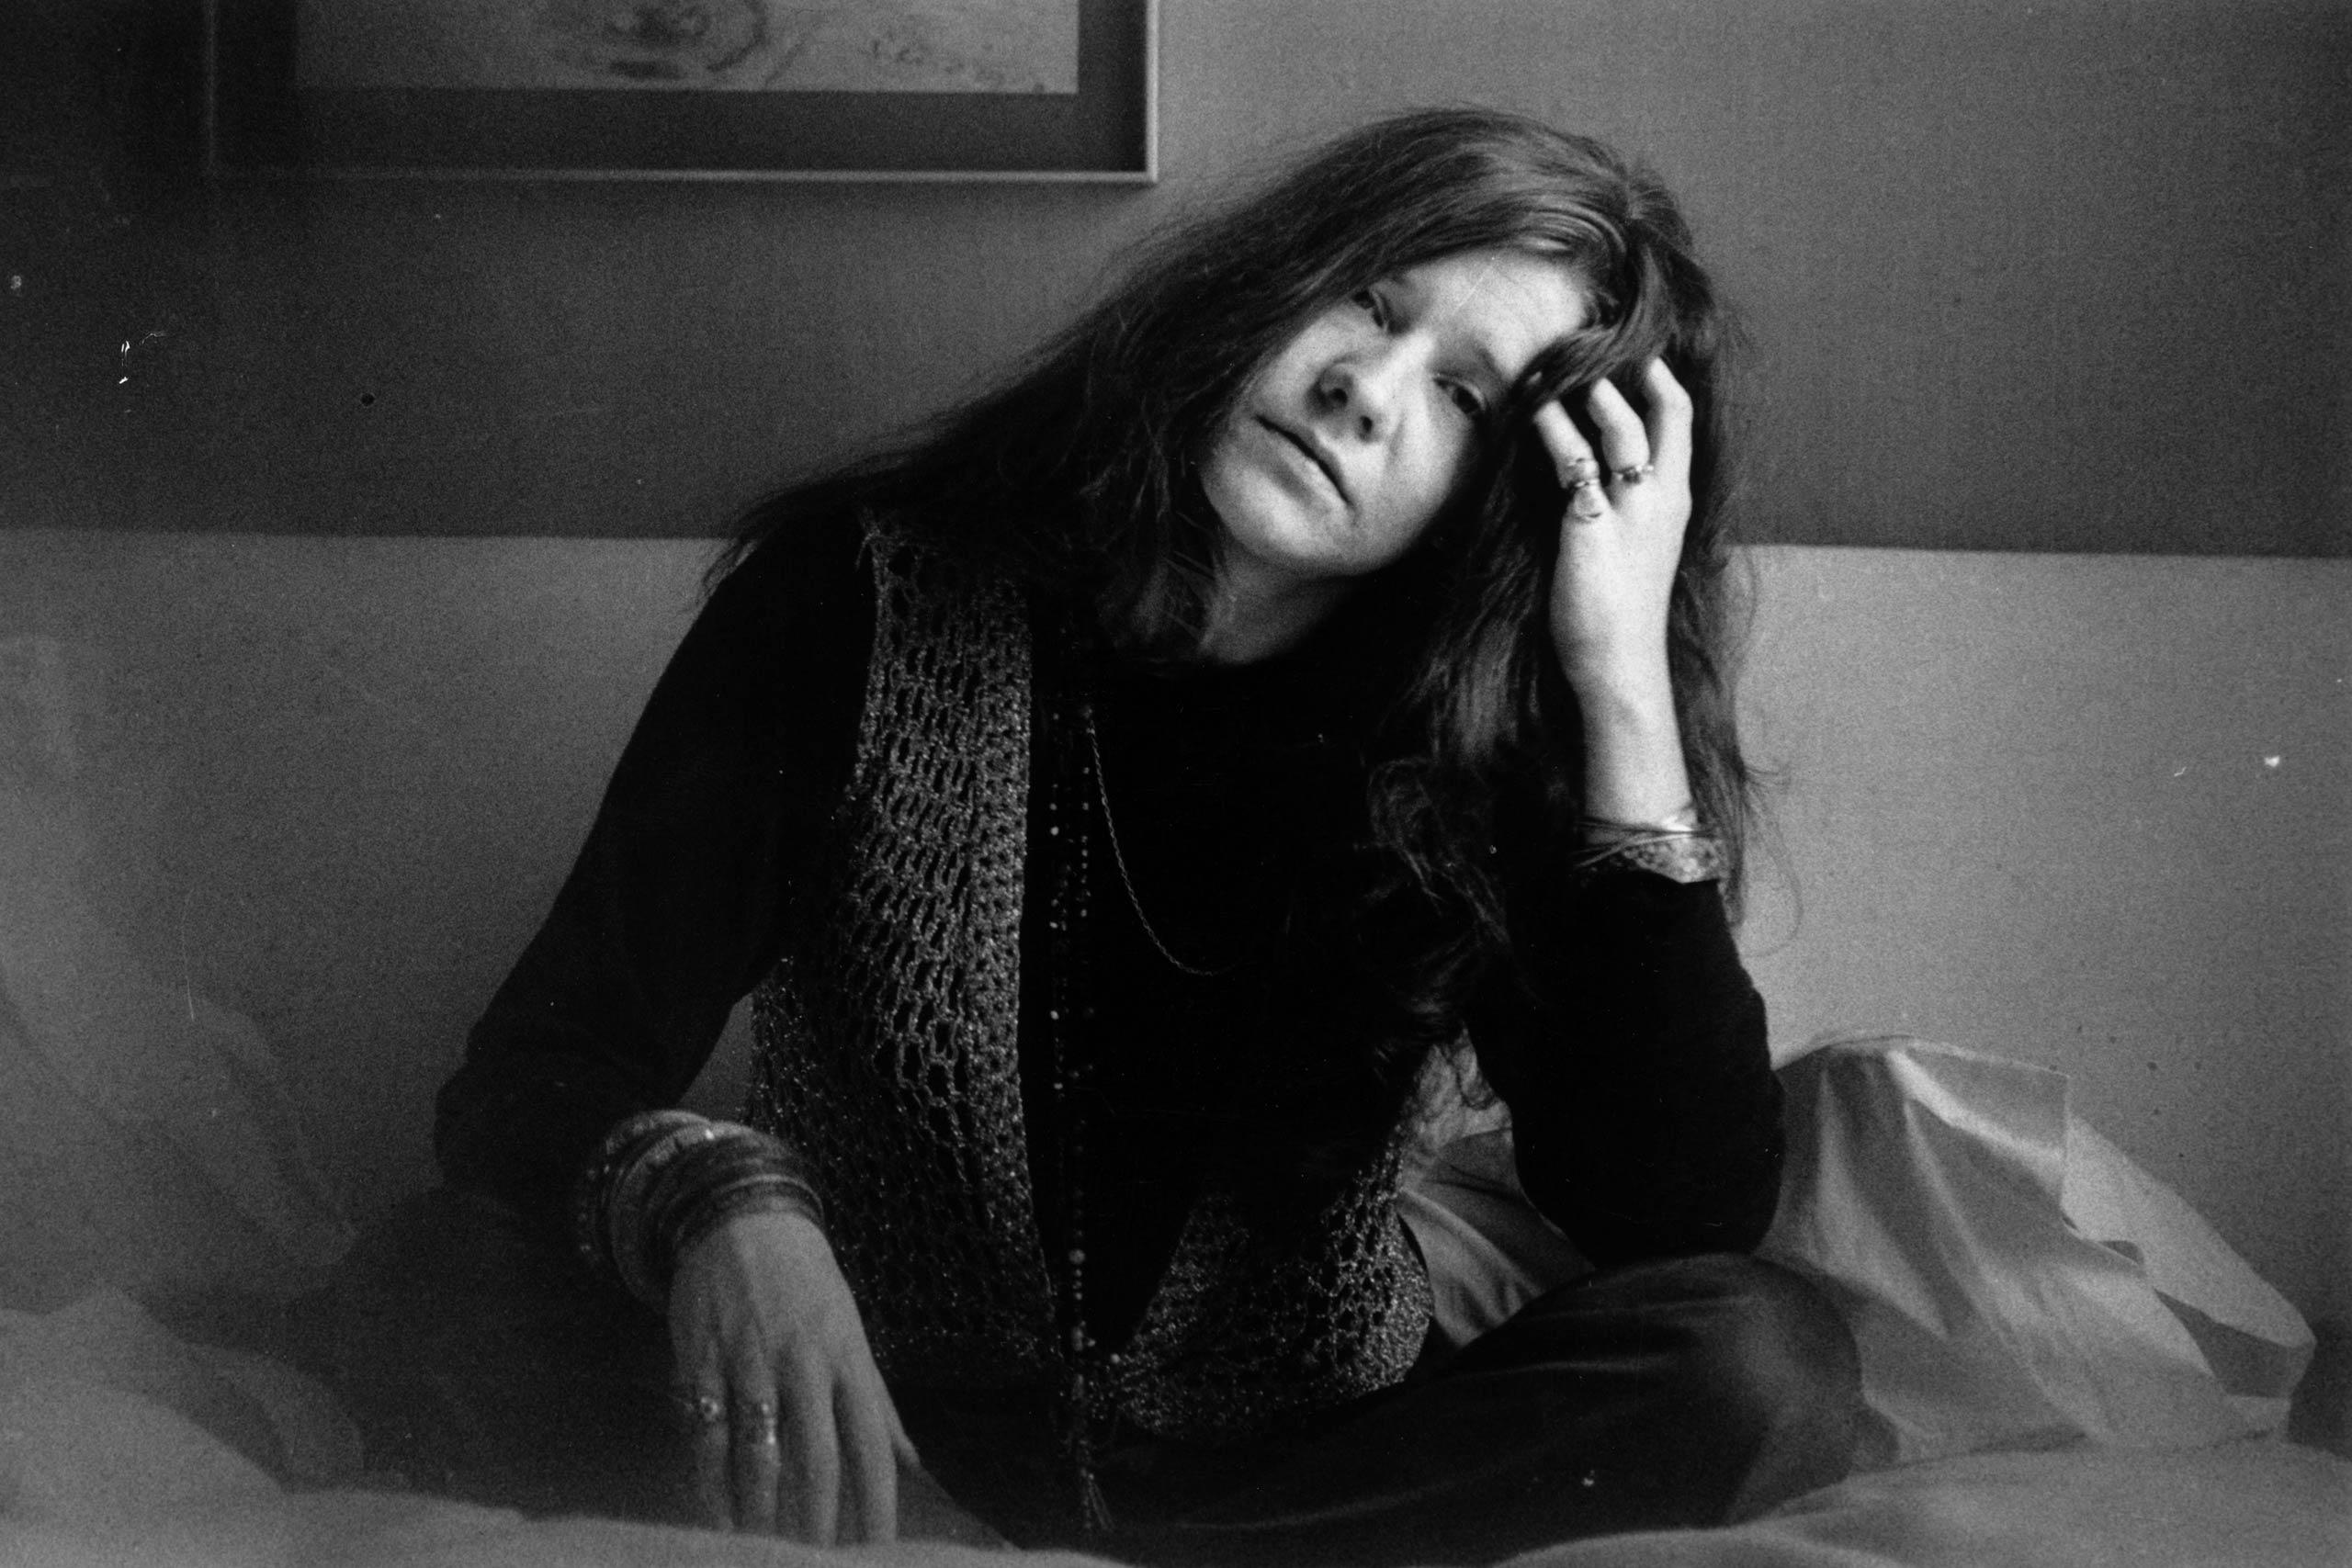 <strong>Janis Joplin</strong>